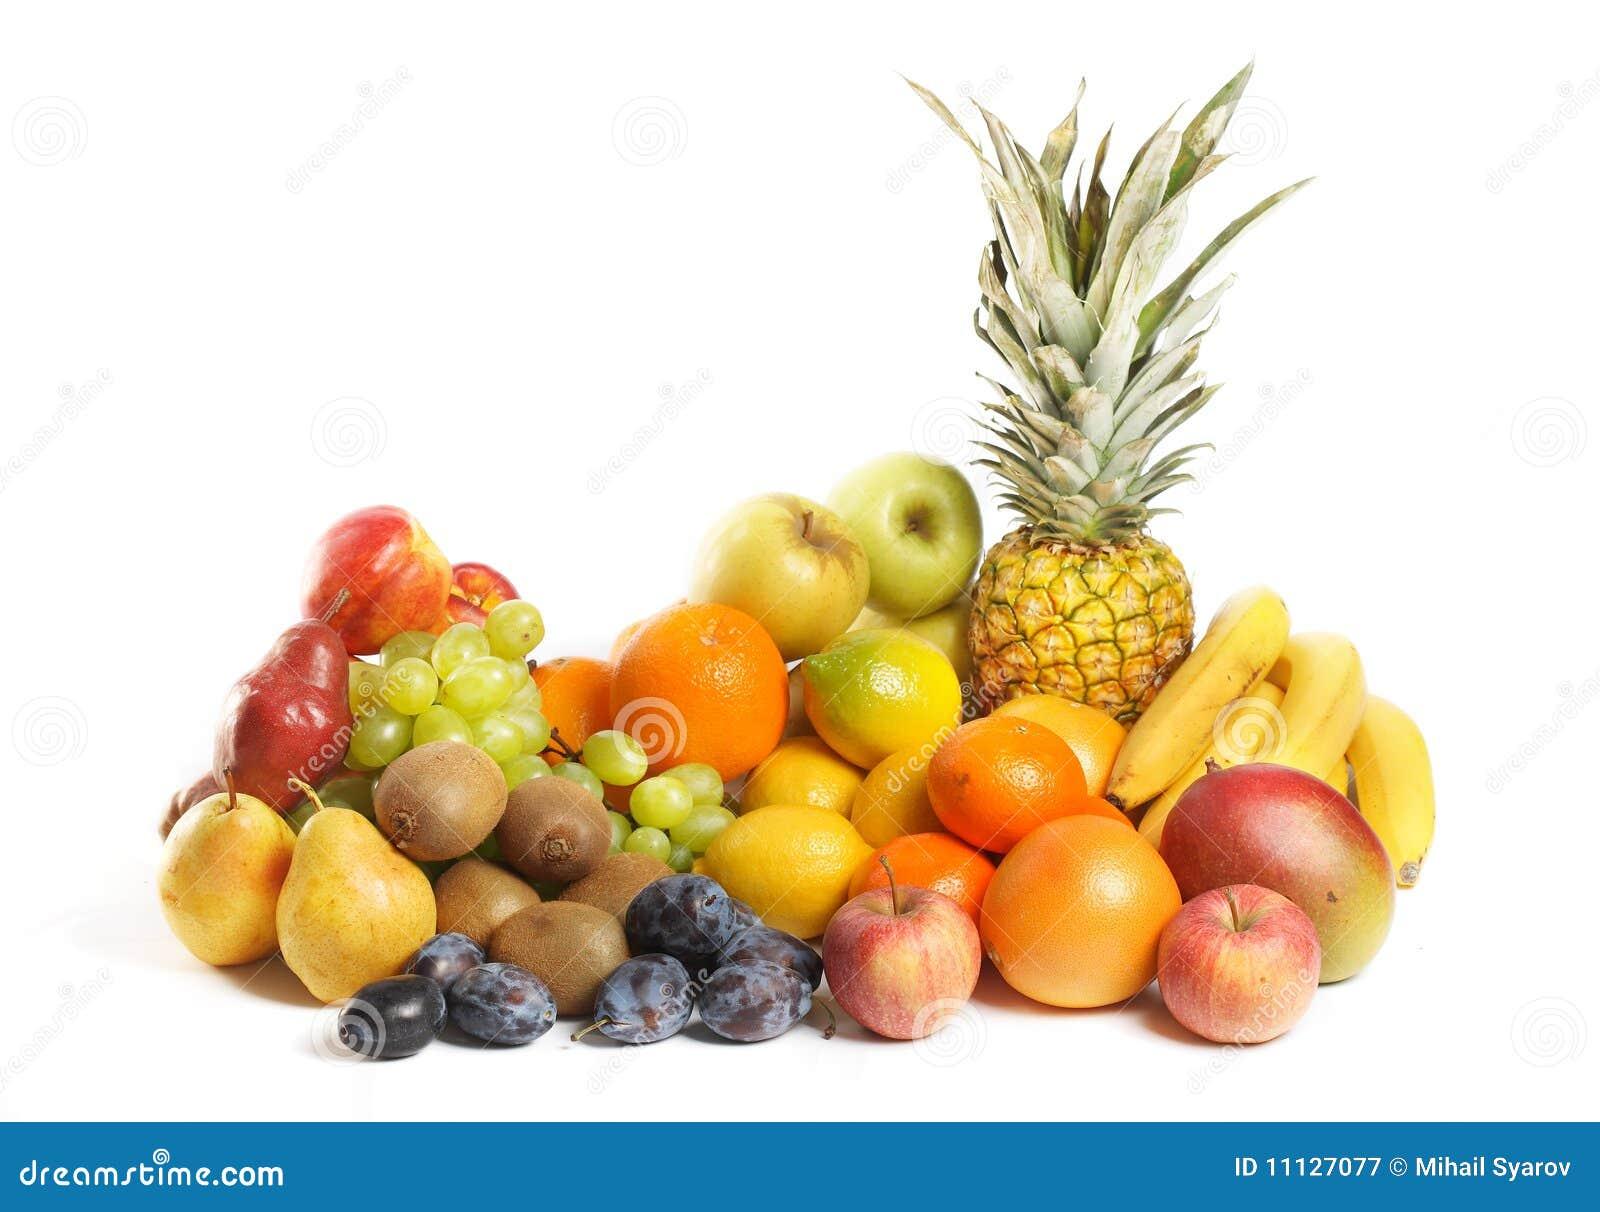 Fruit Group On White Background Royalty Free Stock ...